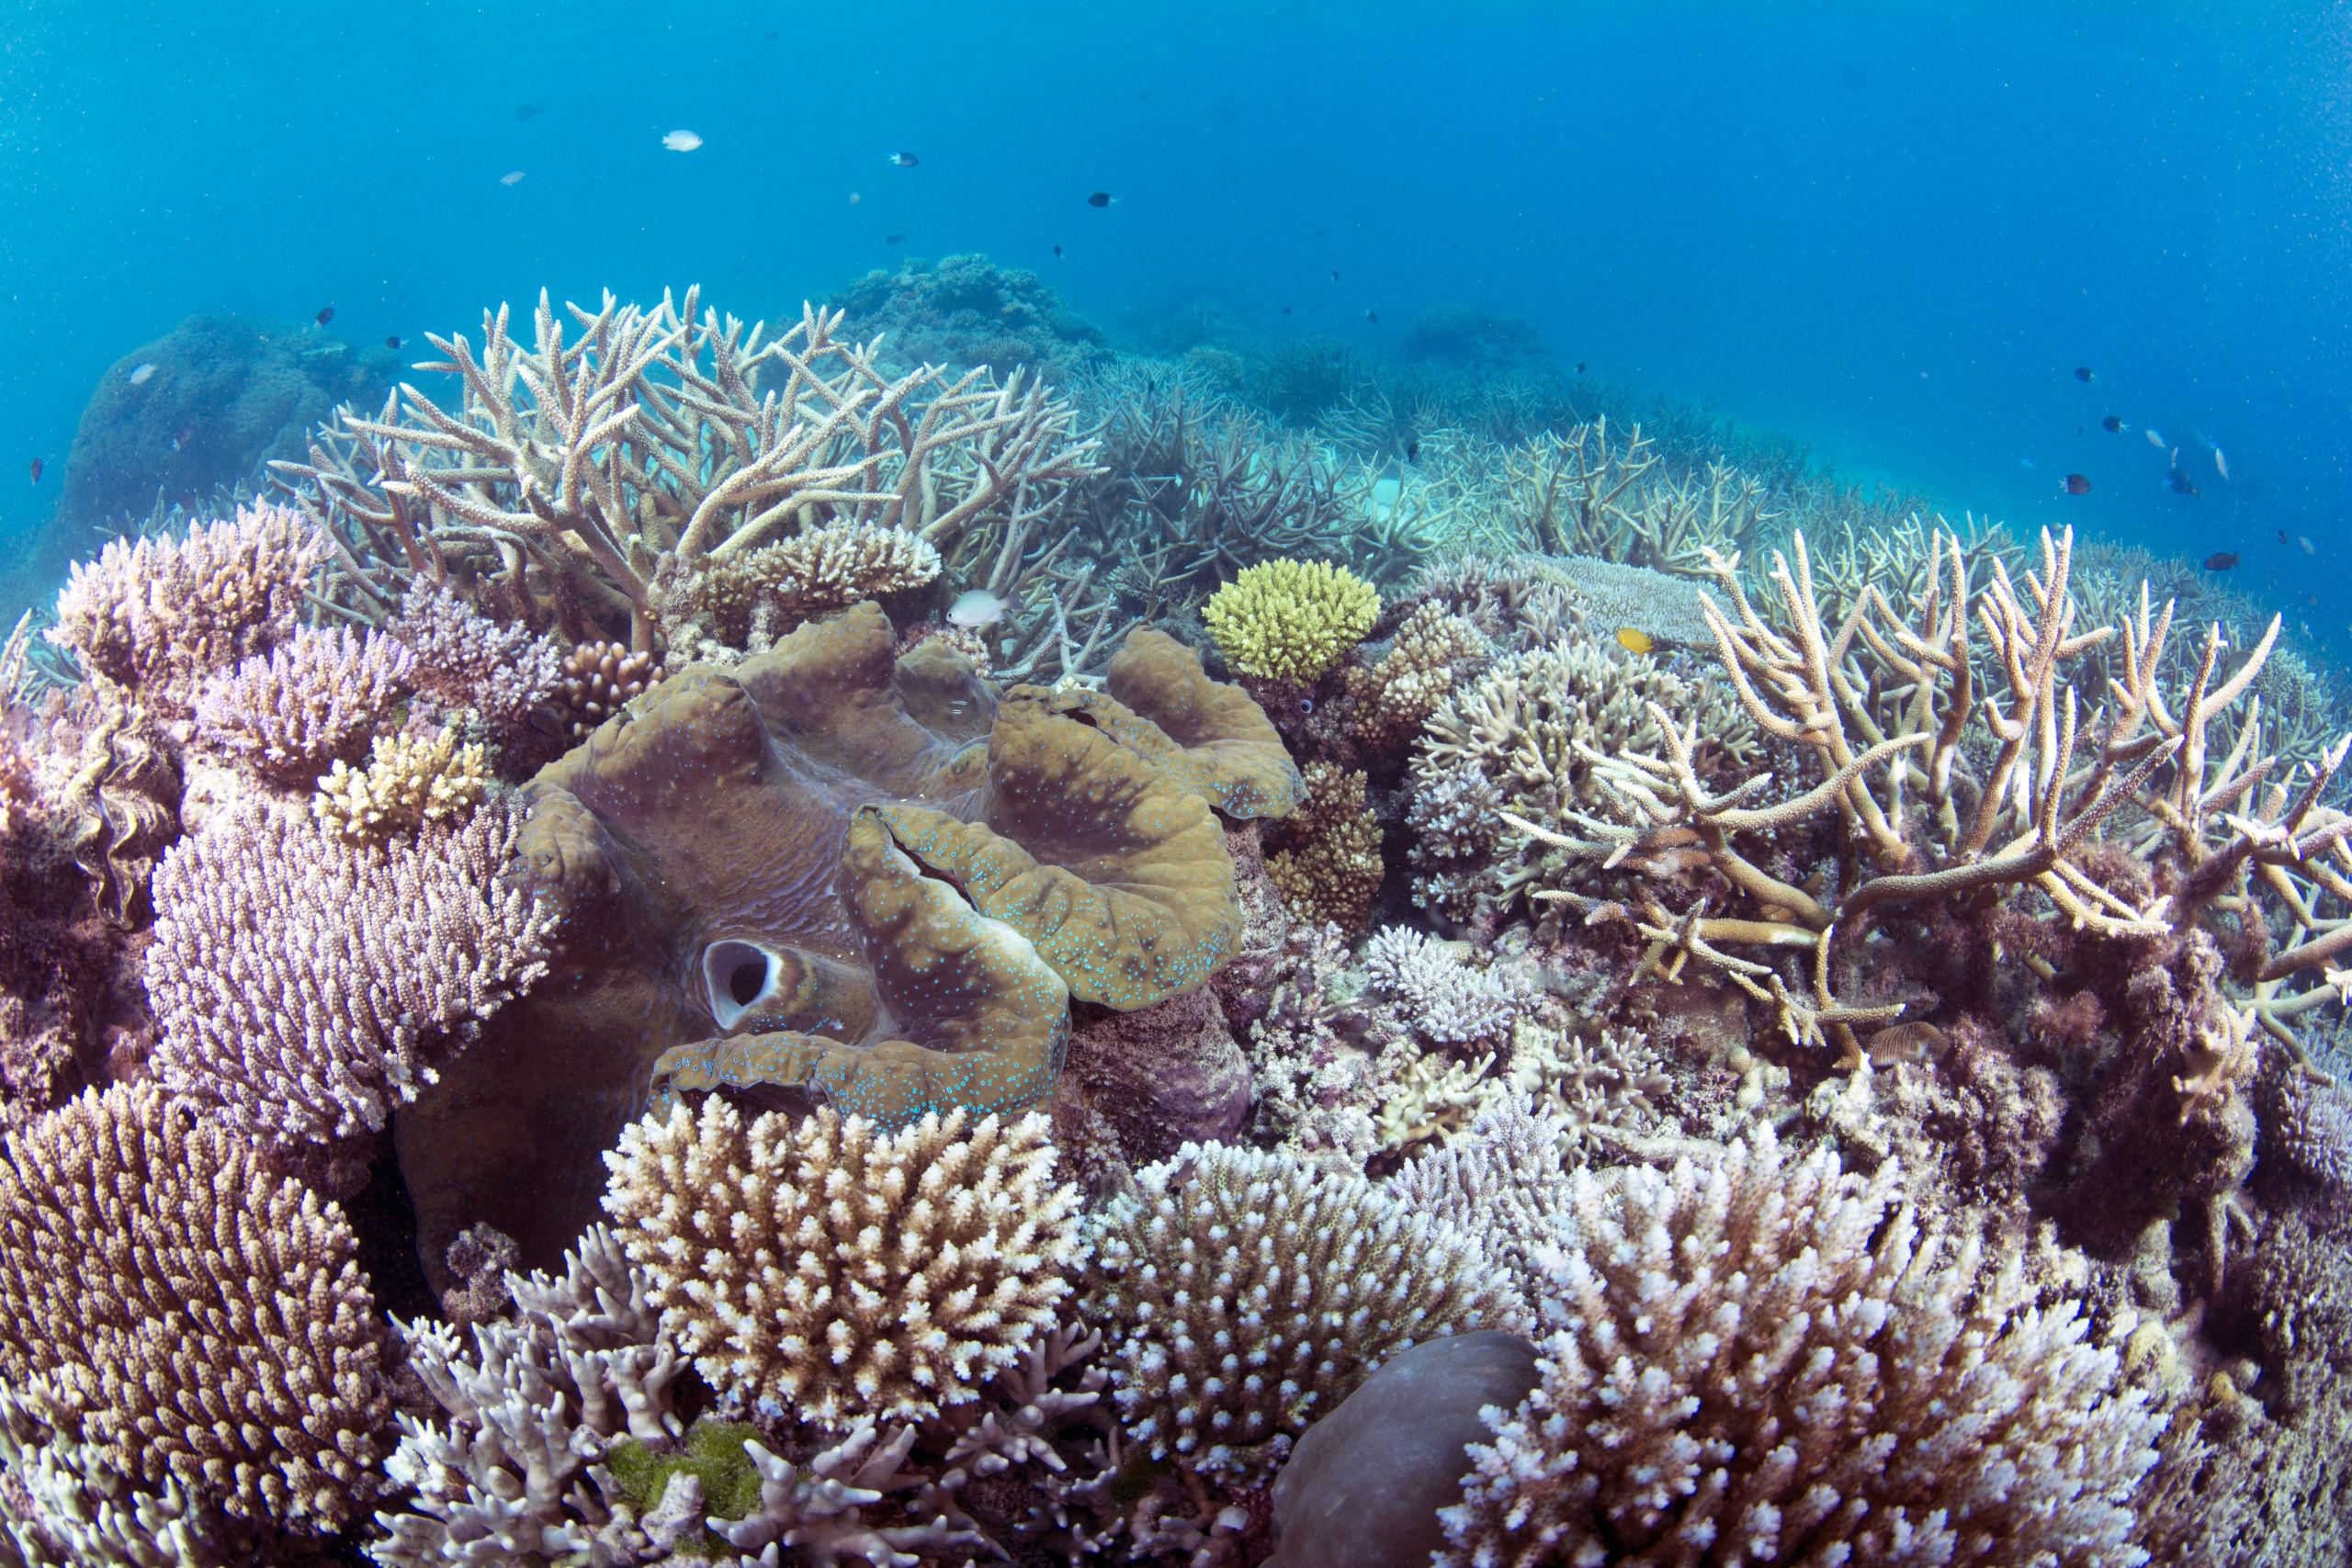 Scuba Diving the Ribbon Reefs Cairns Part 3